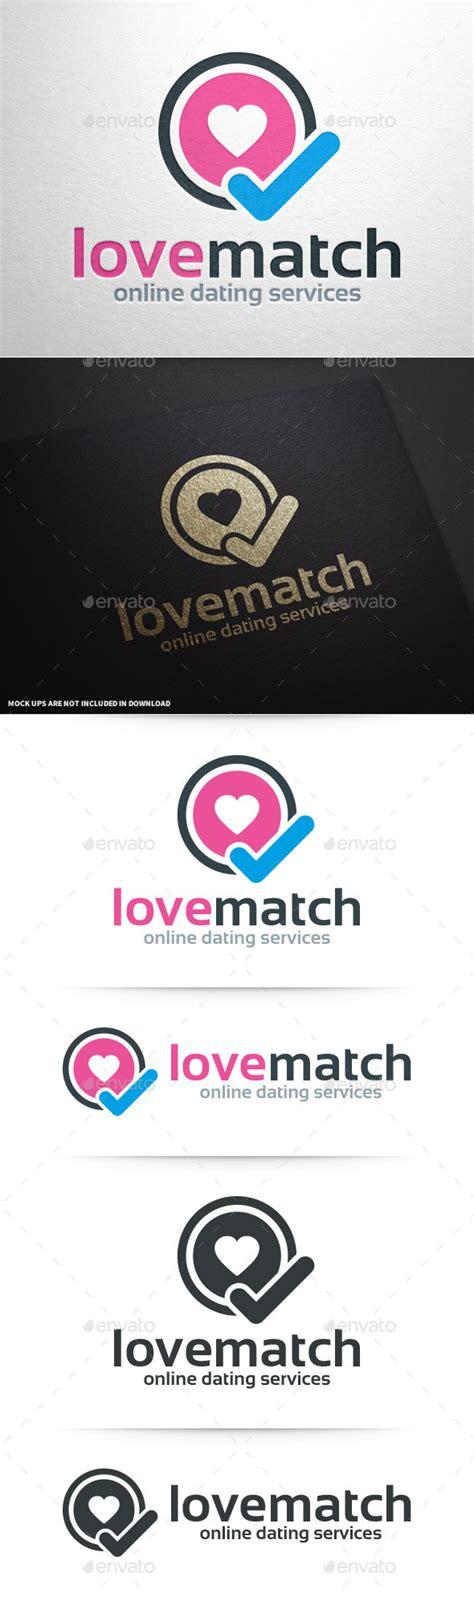 Speed Dating Match Card Template 187 Dondrup Com Speed Dating Card Template